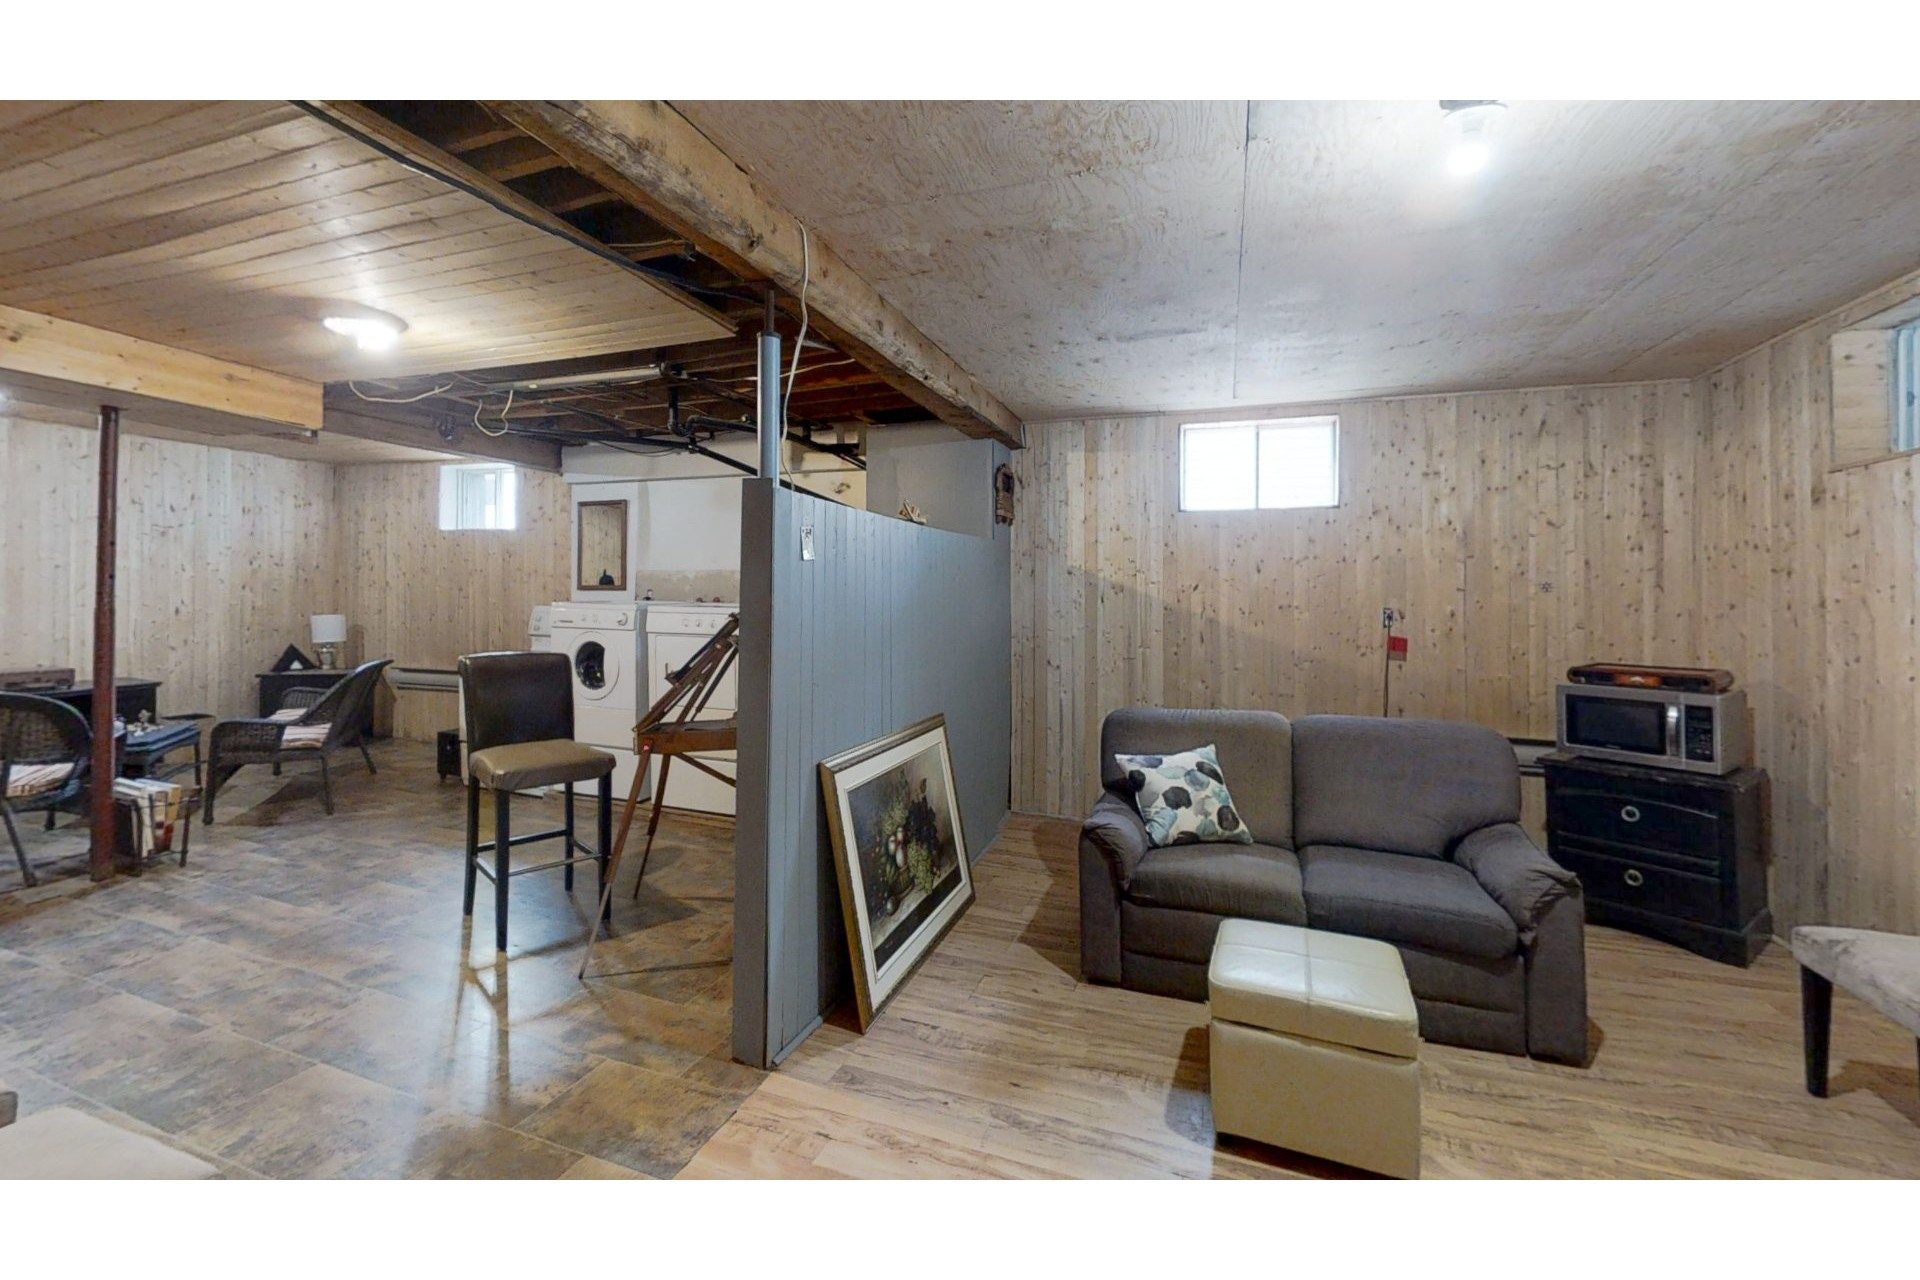 image 9 - House For sale Saint-Calixte - 7 rooms